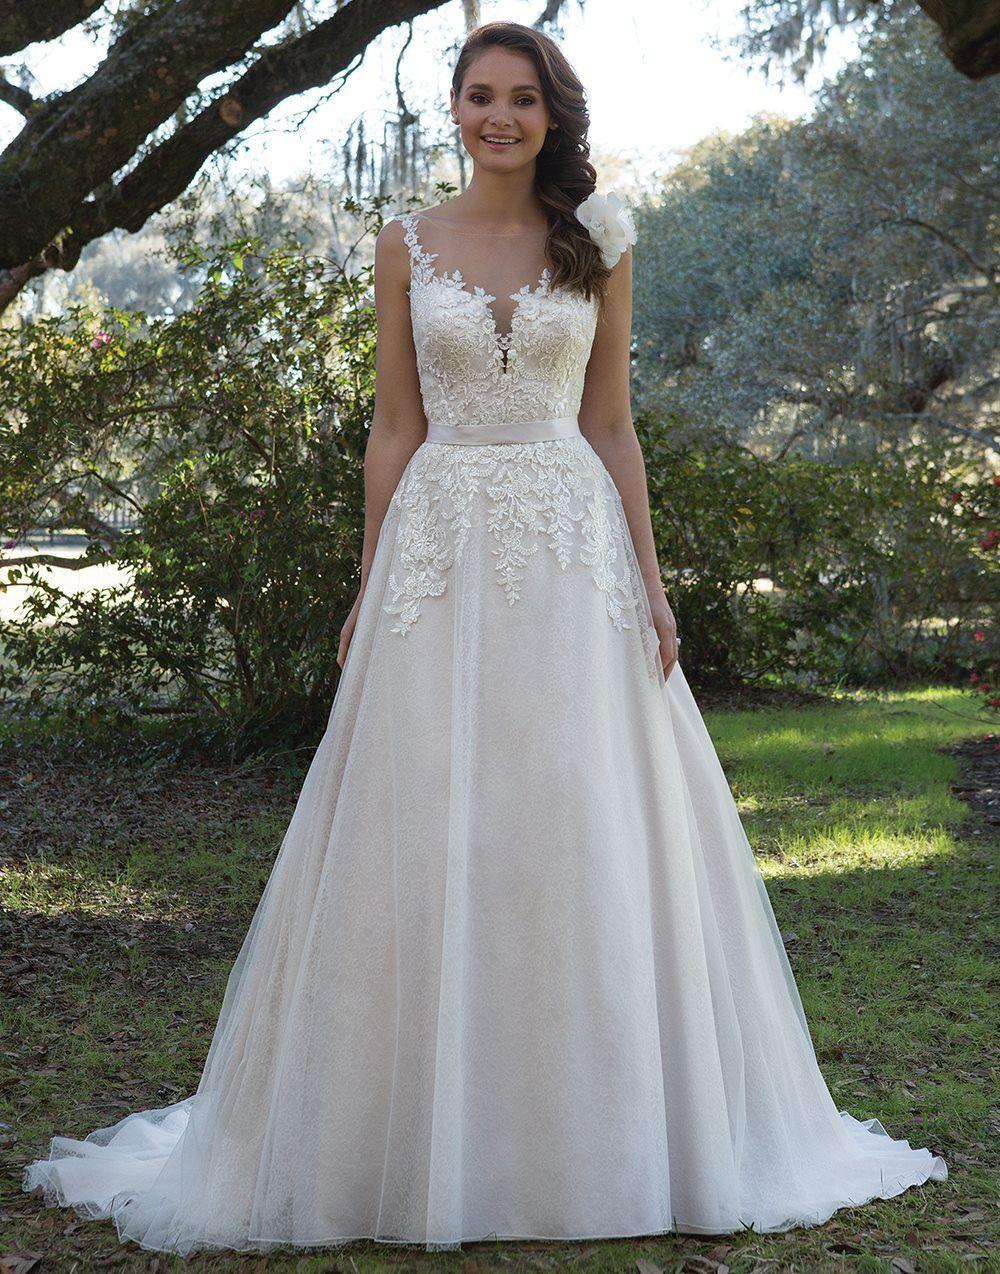 325b88b455ca Pin by Katrina Lajoie on Wedding